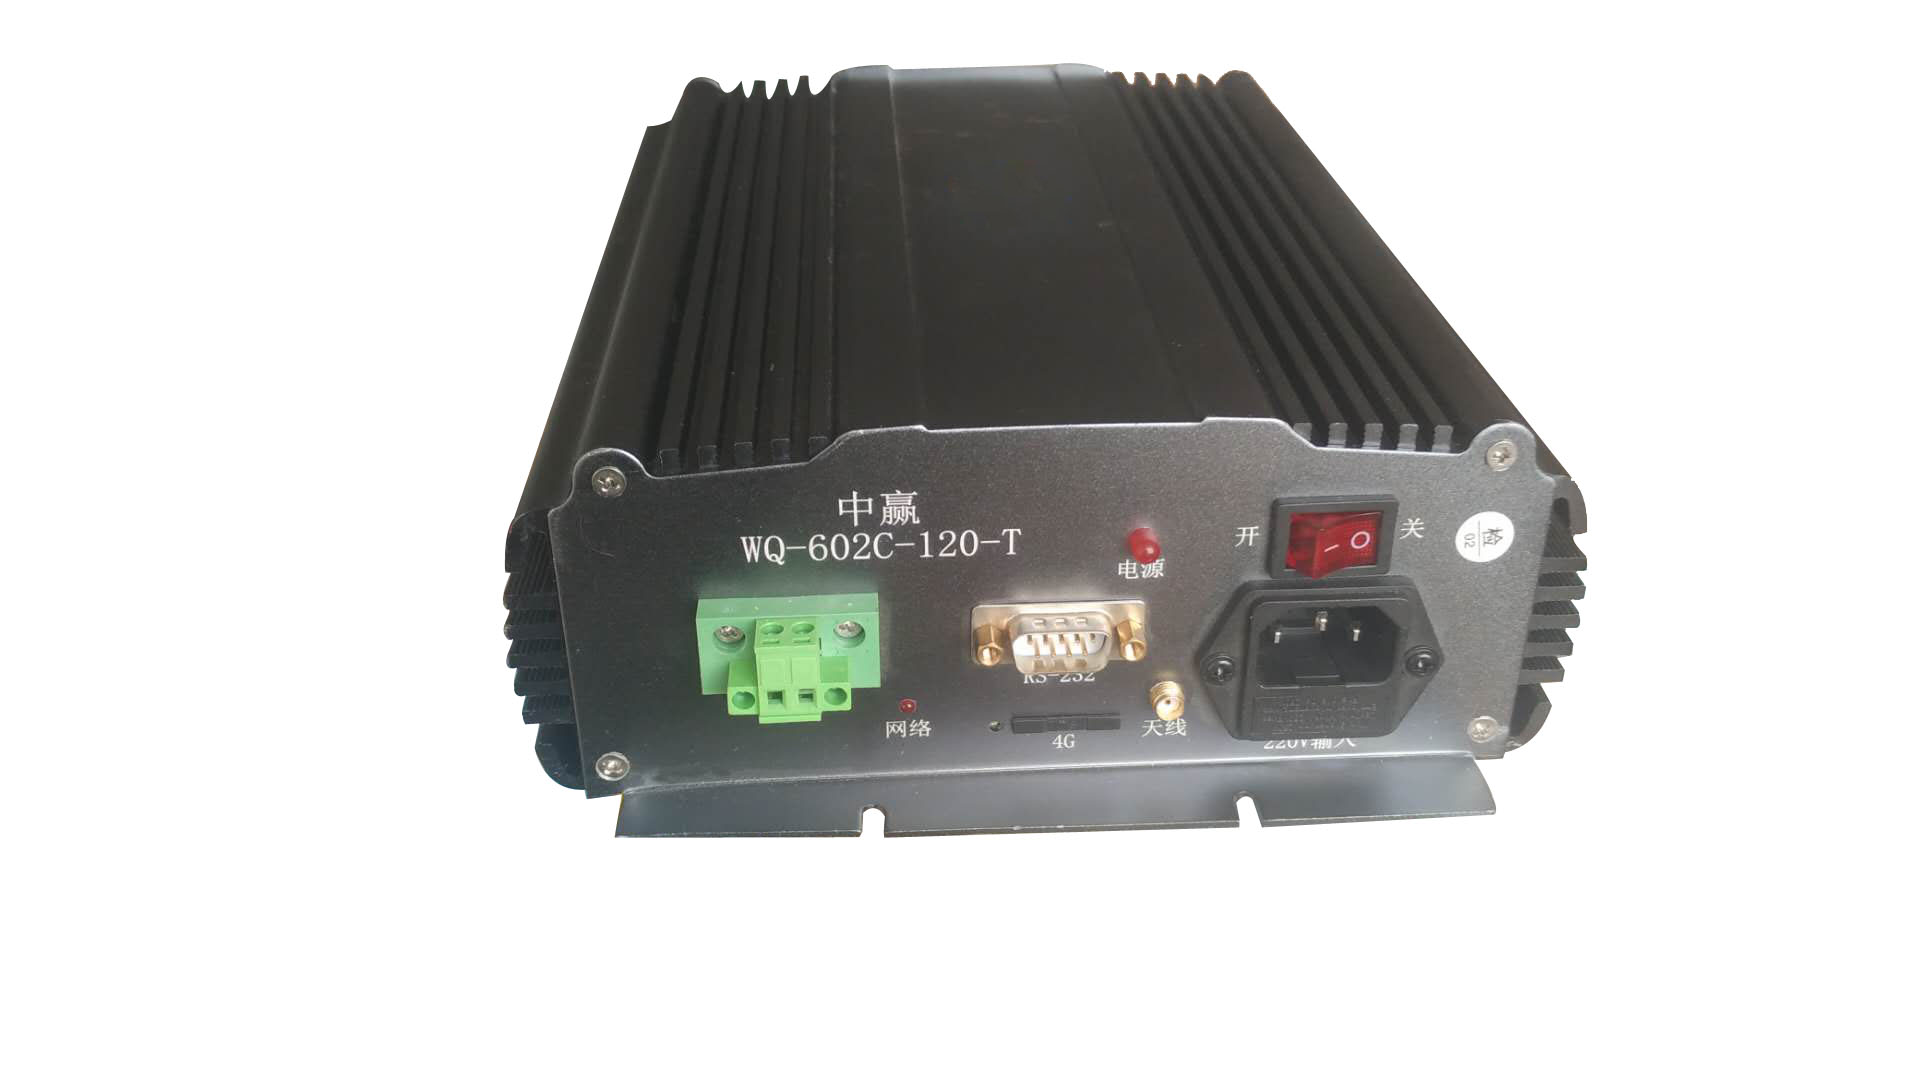 WQ-602C-120-T无线预警广播